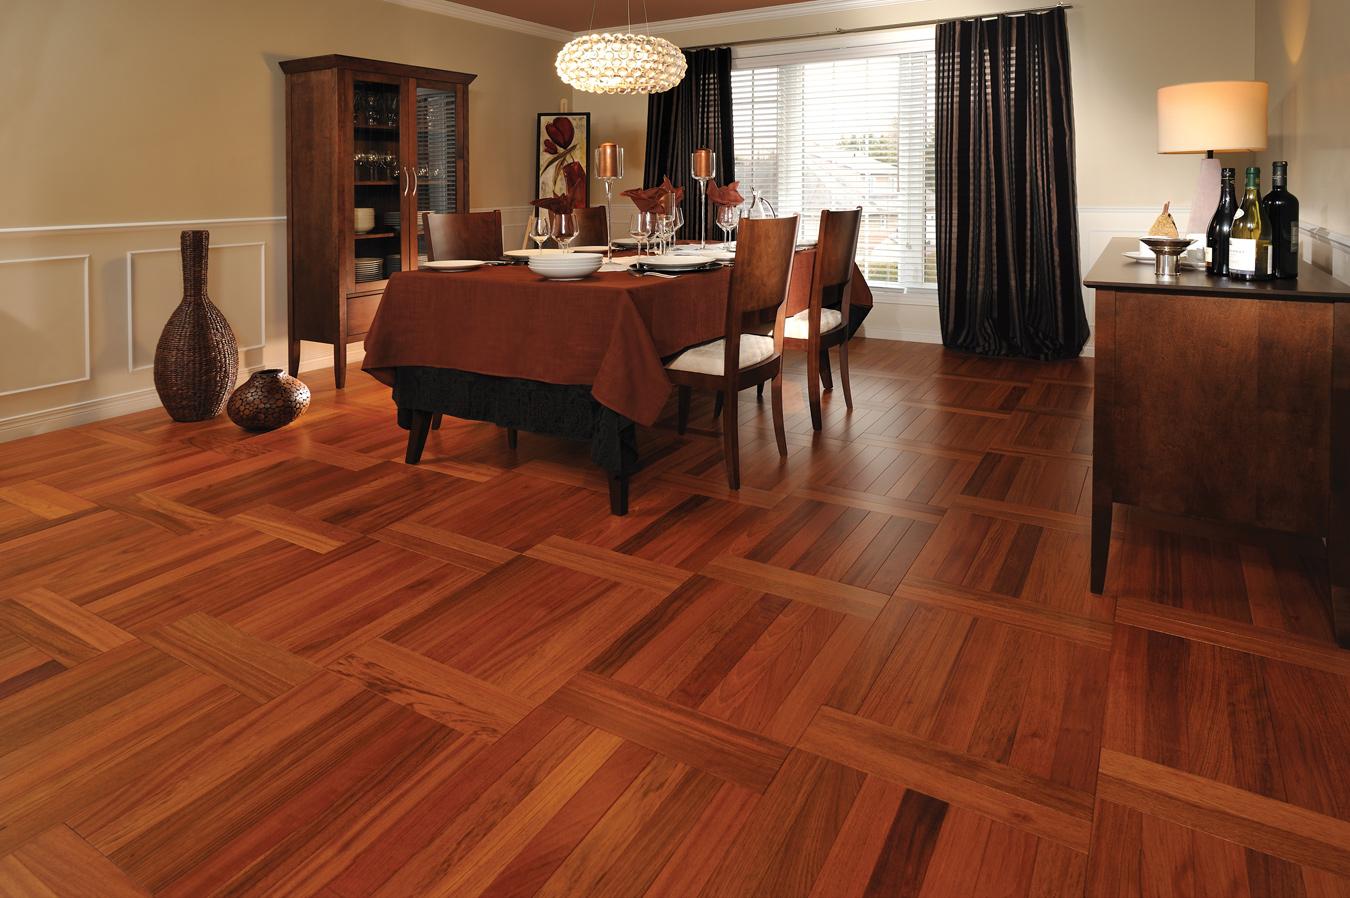 Brazilian Hardwood Floor brazilian walnut hardwood floors pros and cons Hardwood Floor Profiles Brazilian Cherry